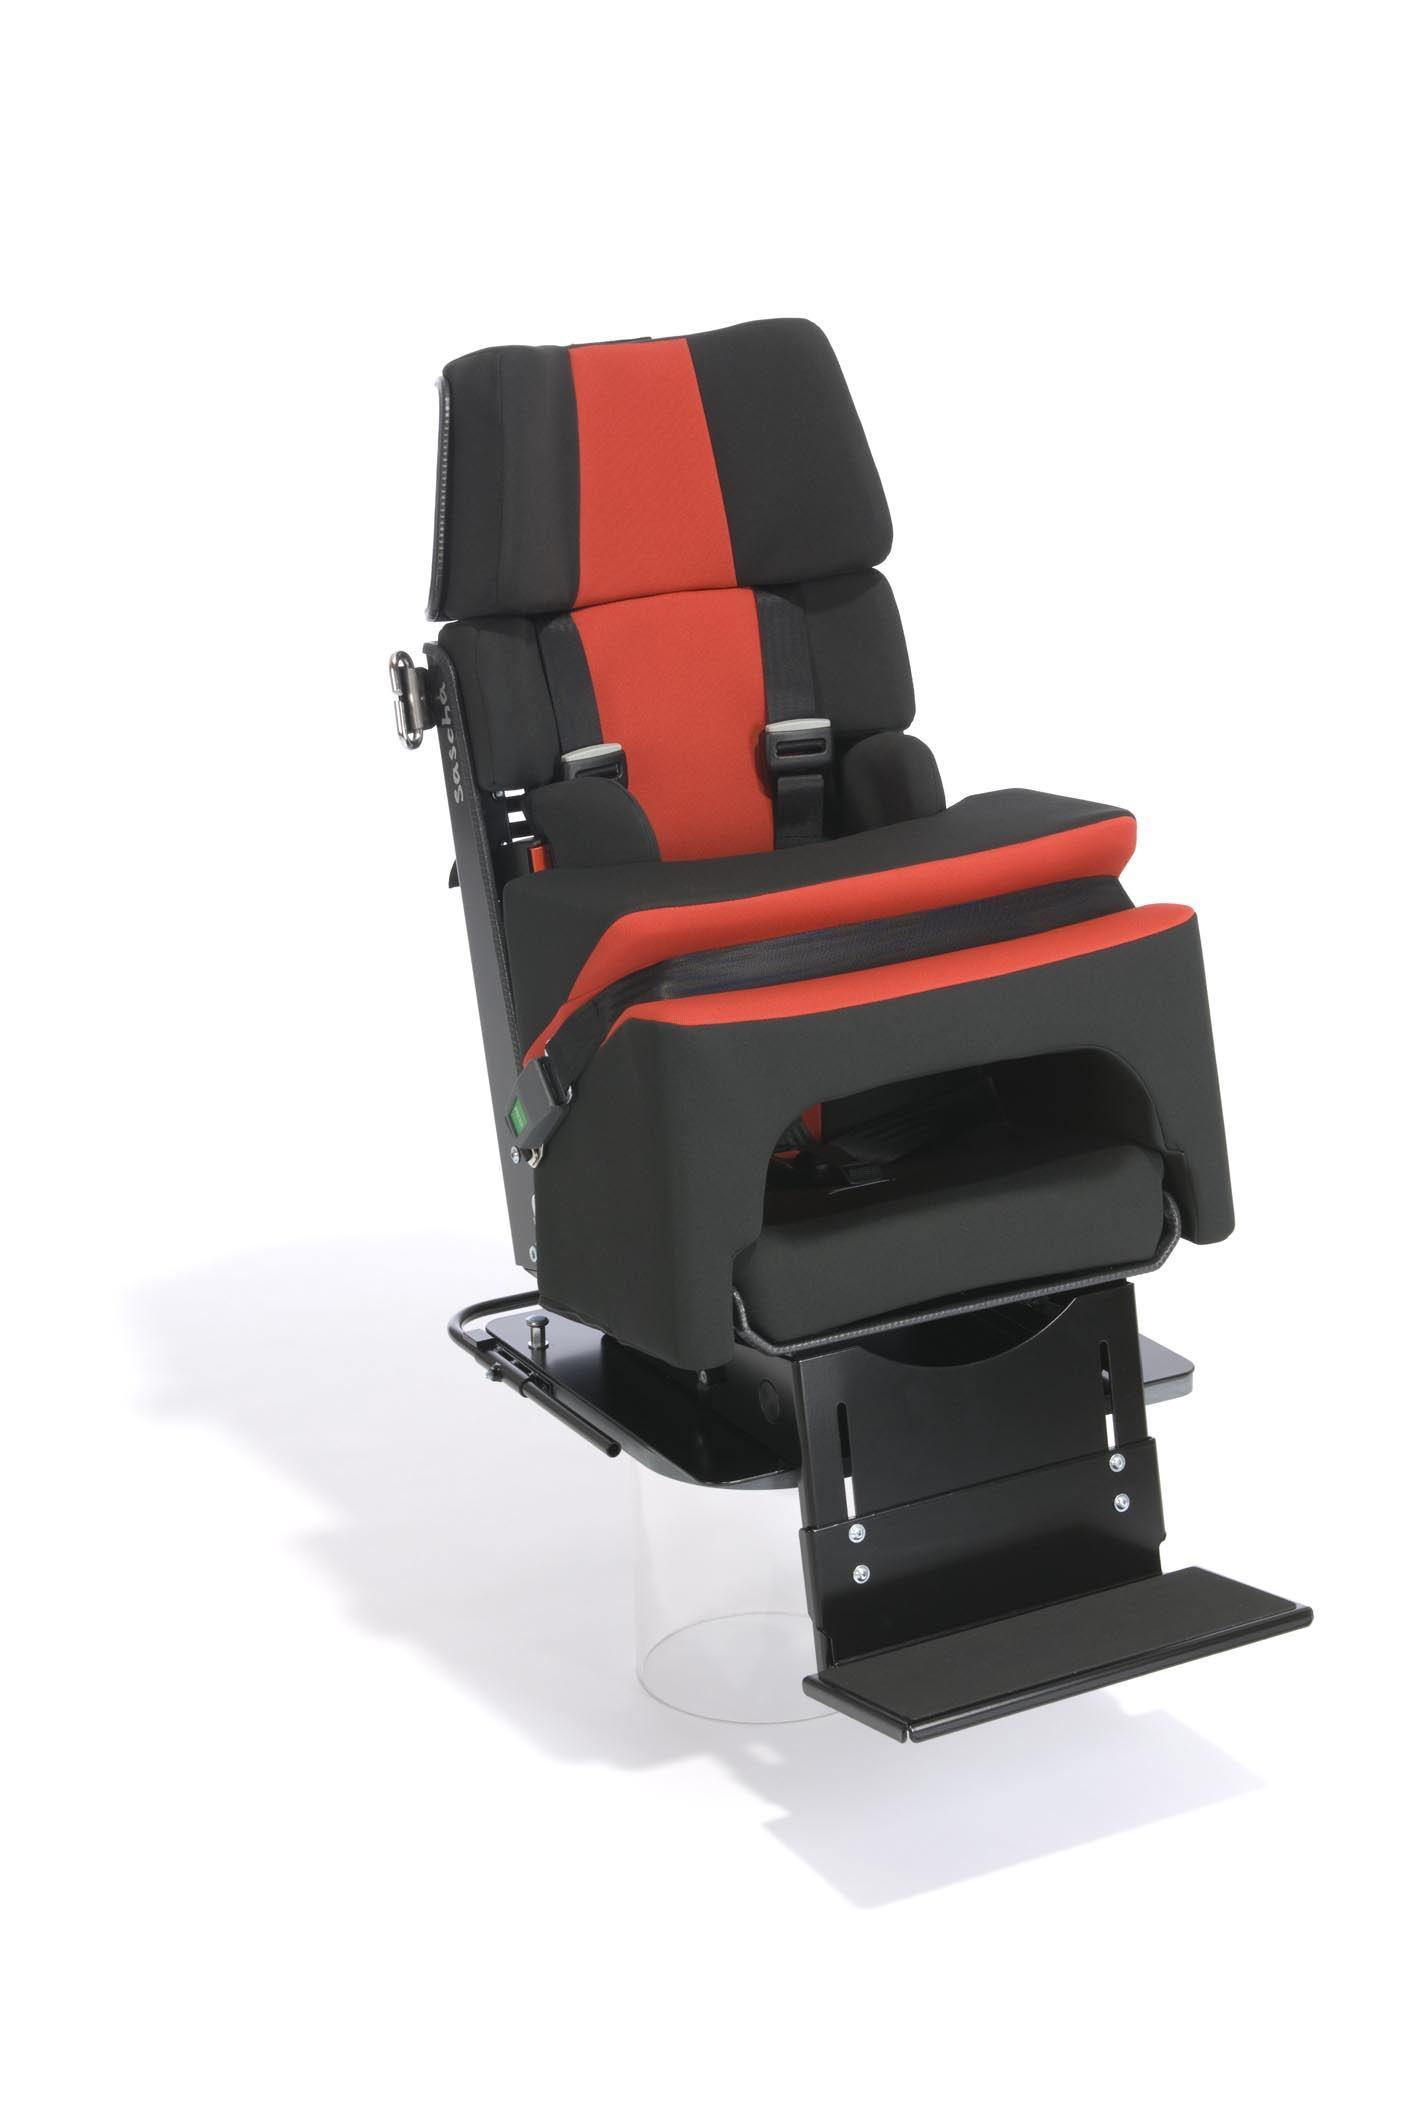 kinder-rehatechnik-ergonomic